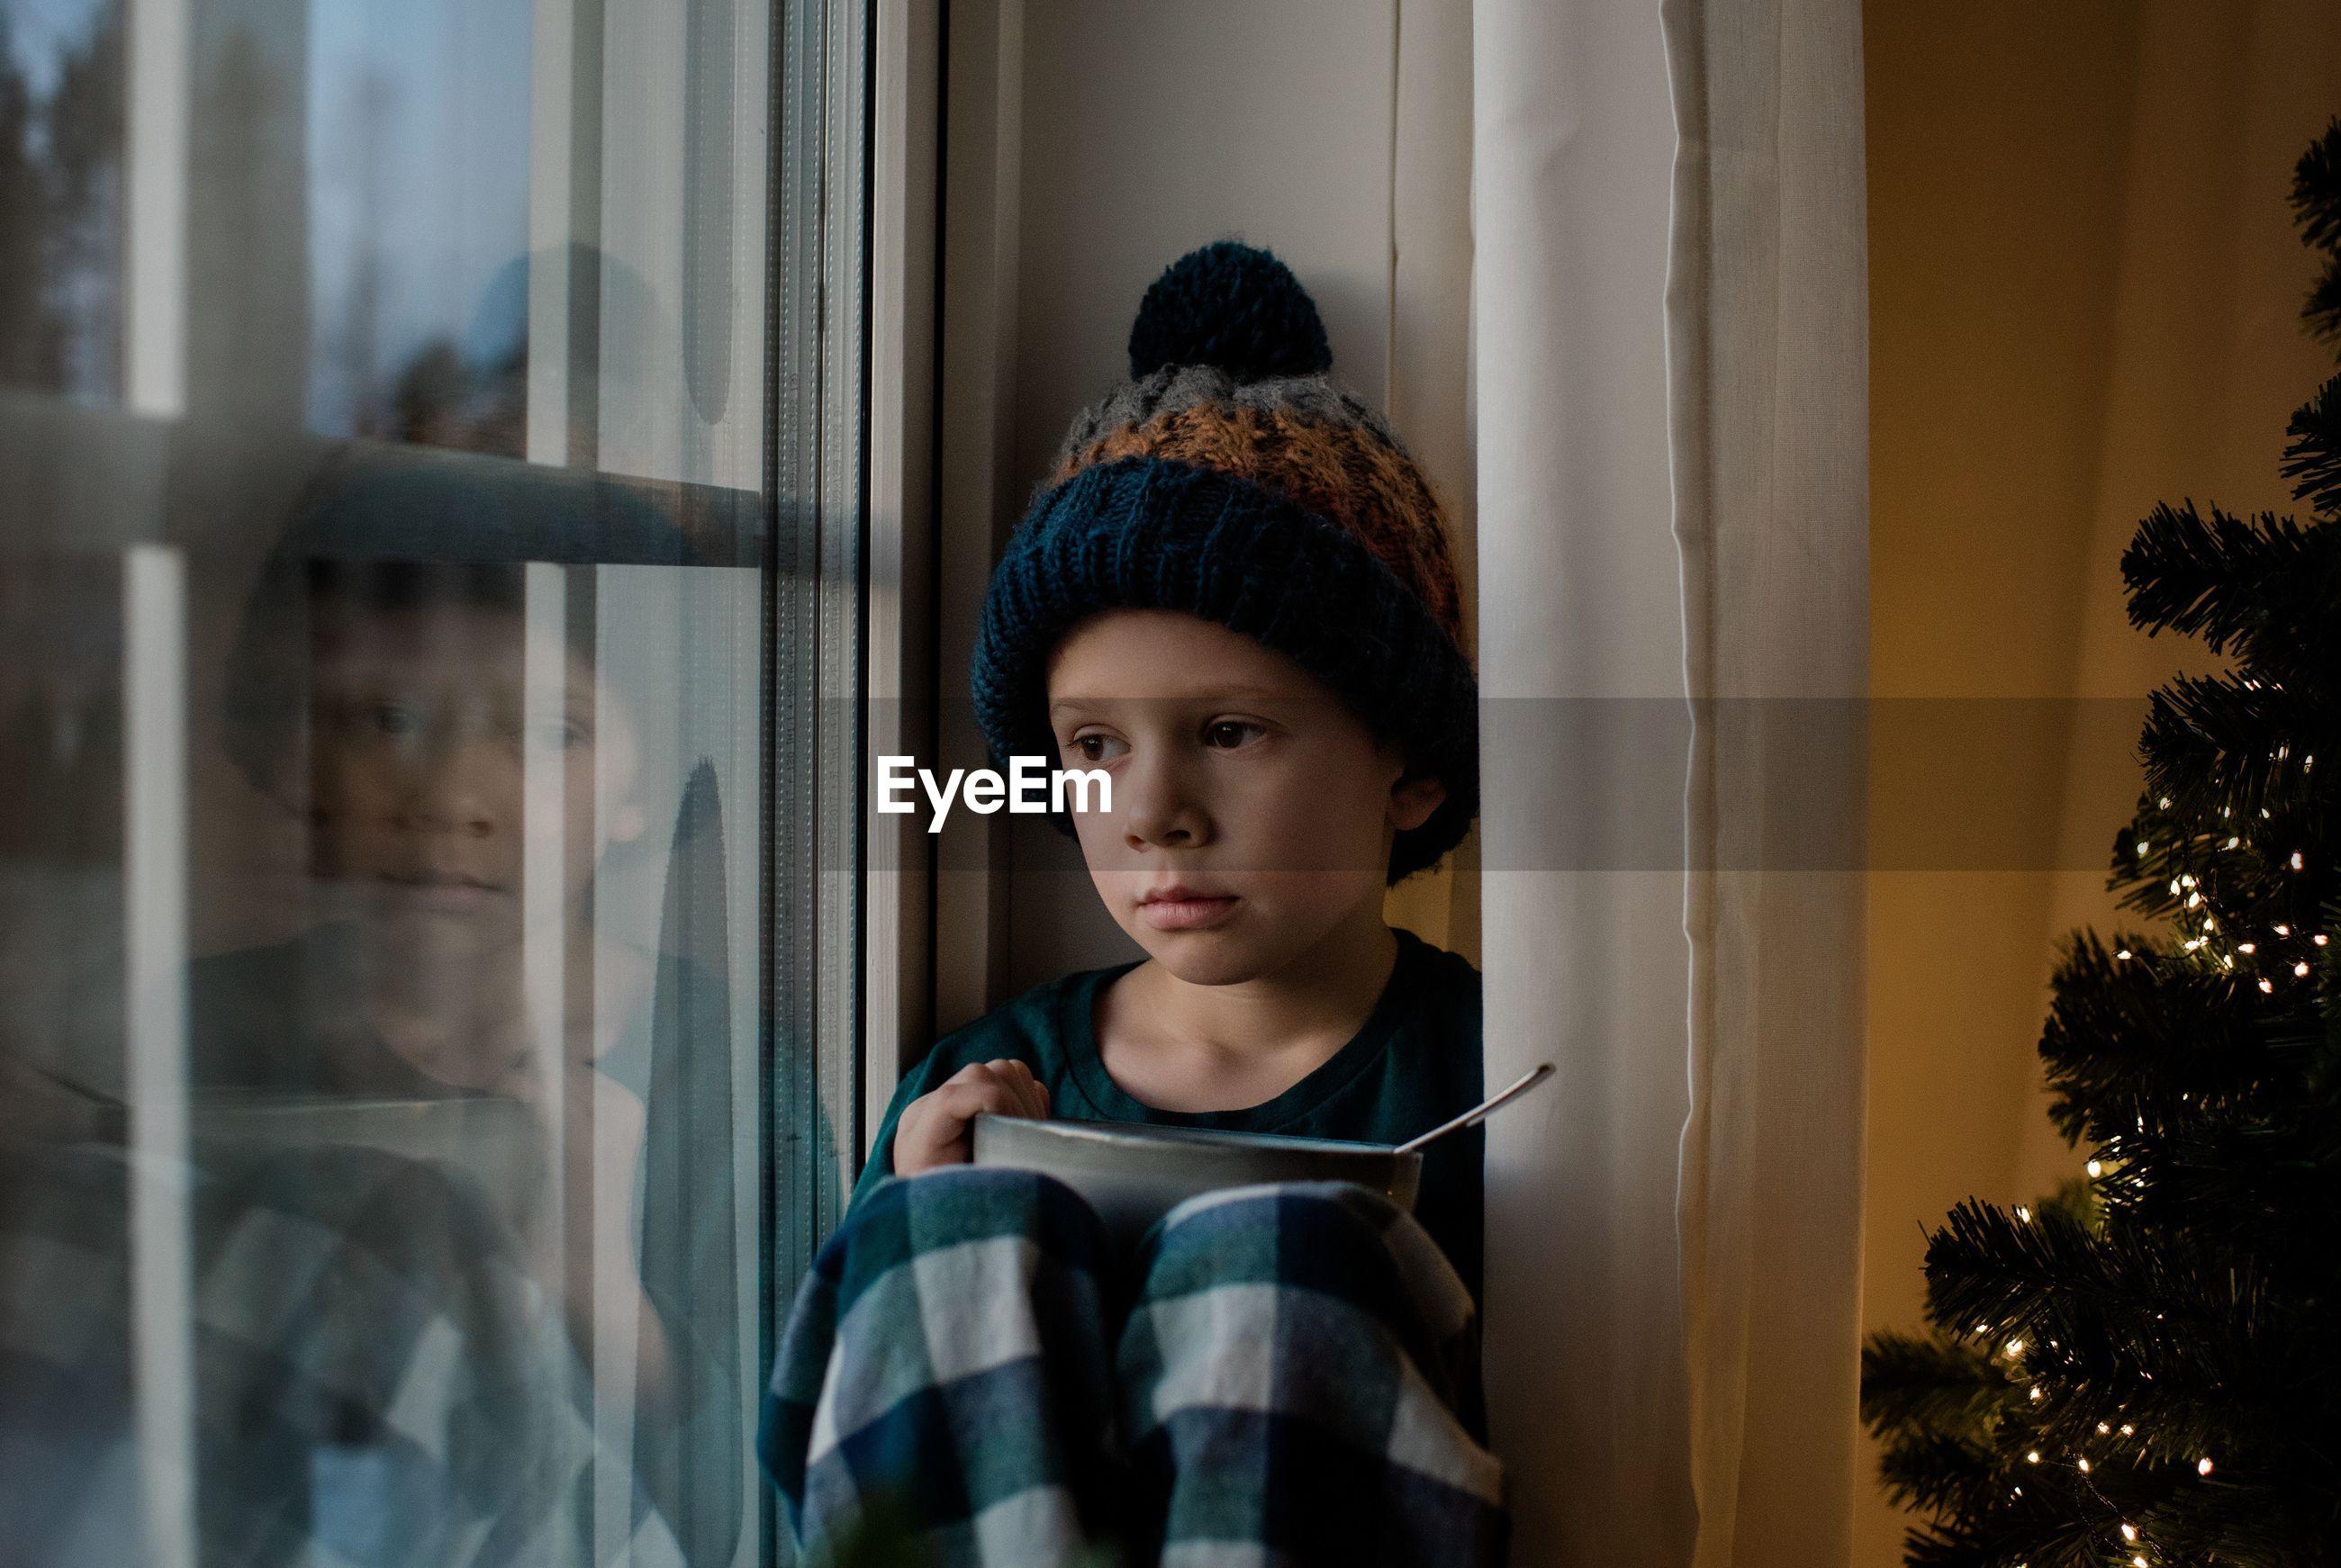 PORTRAIT OF BOY LOOKING AT WINDOW